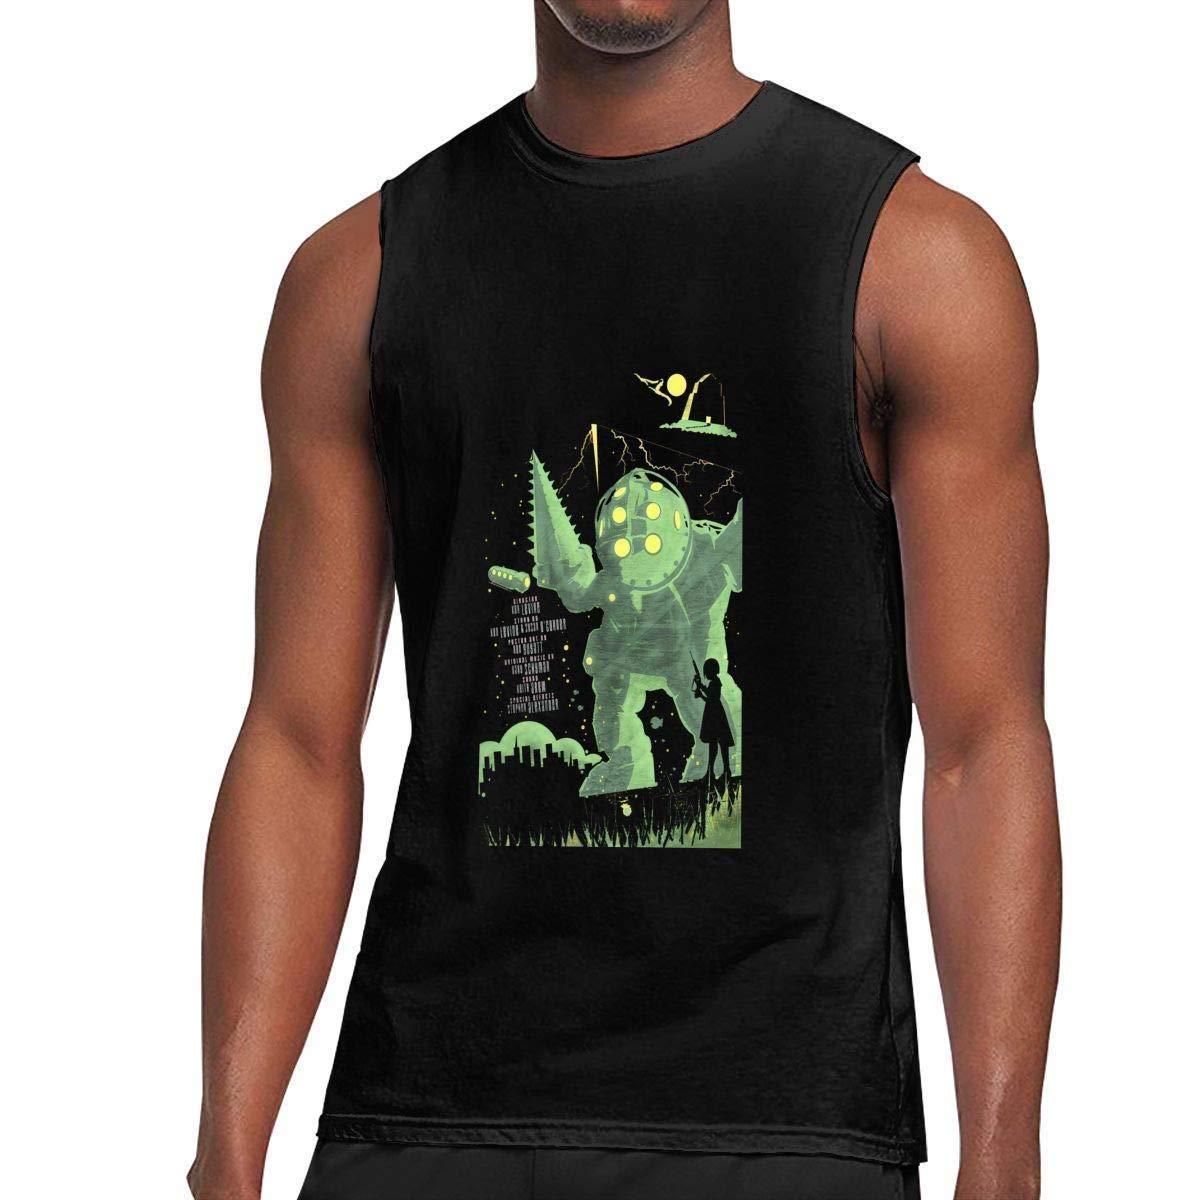 Zpanter S Sleeveless T Shirts Bioshock Workout Tank Tops Gym Bodybuilding Tshirts Black